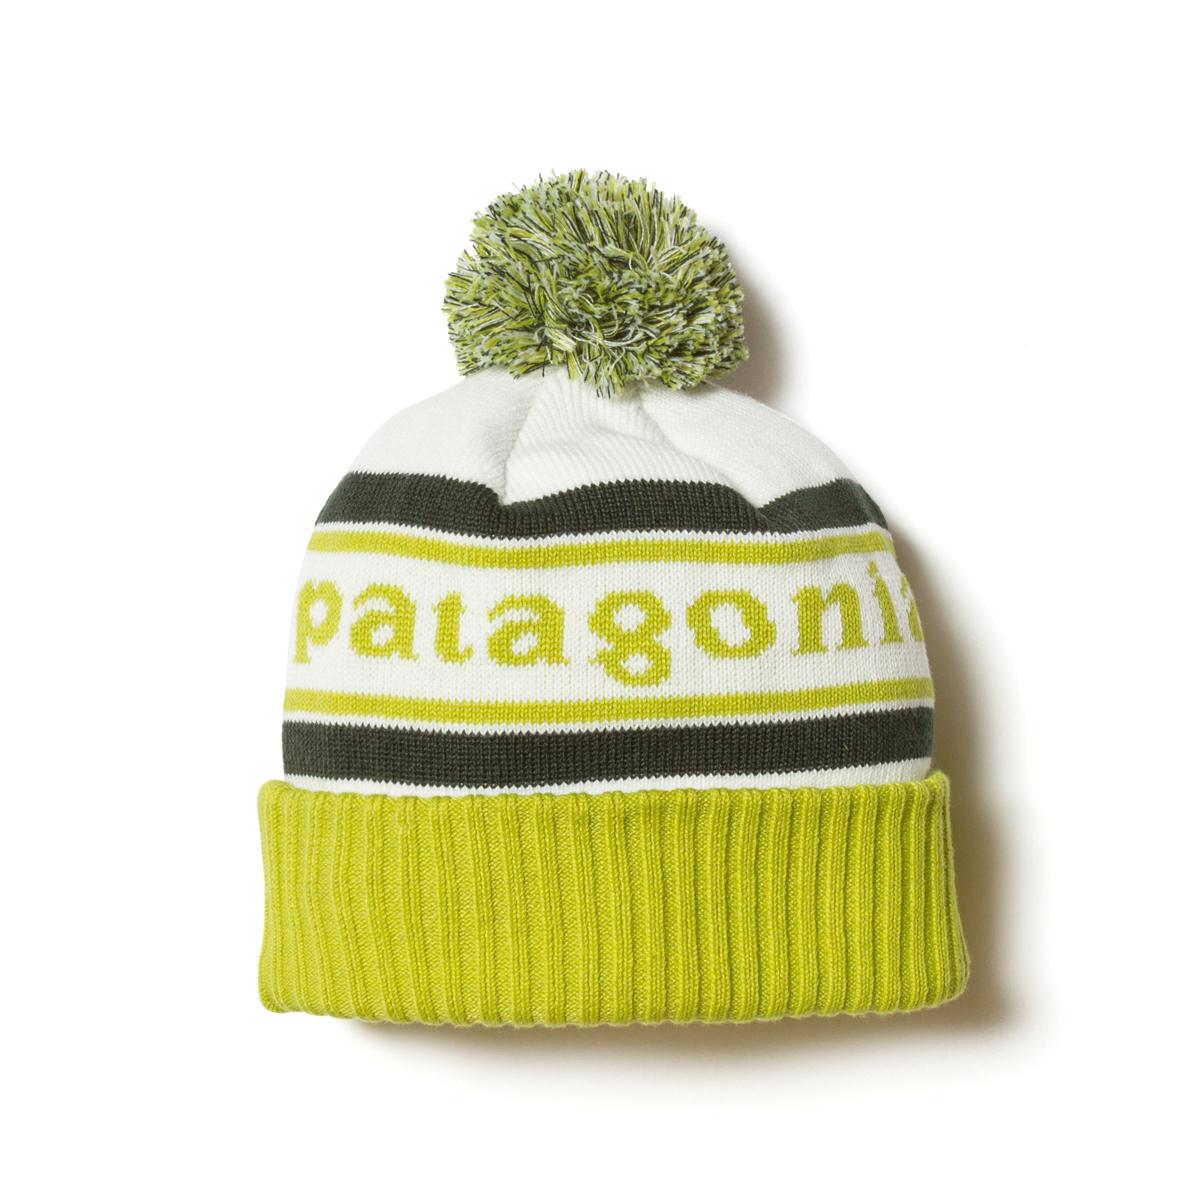 Patagonia Powder Town Beanie £35